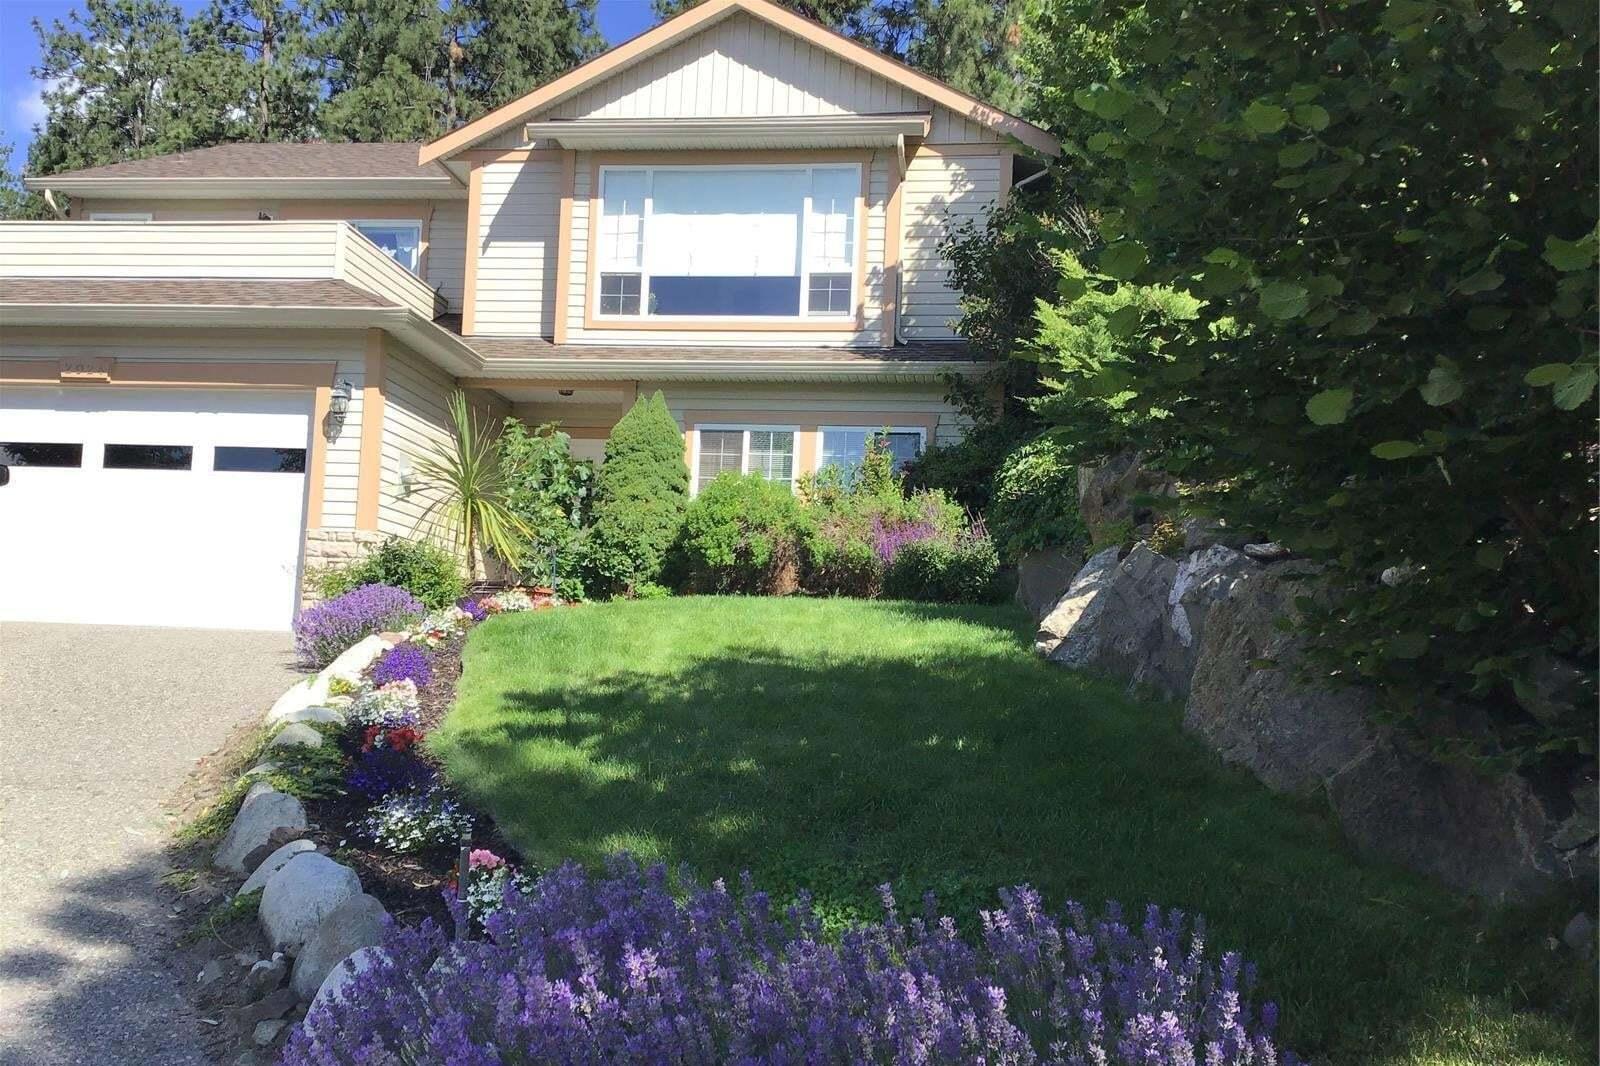 House for sale at 2024 Rosealee Ln West Kelowna British Columbia - MLS: 10202853